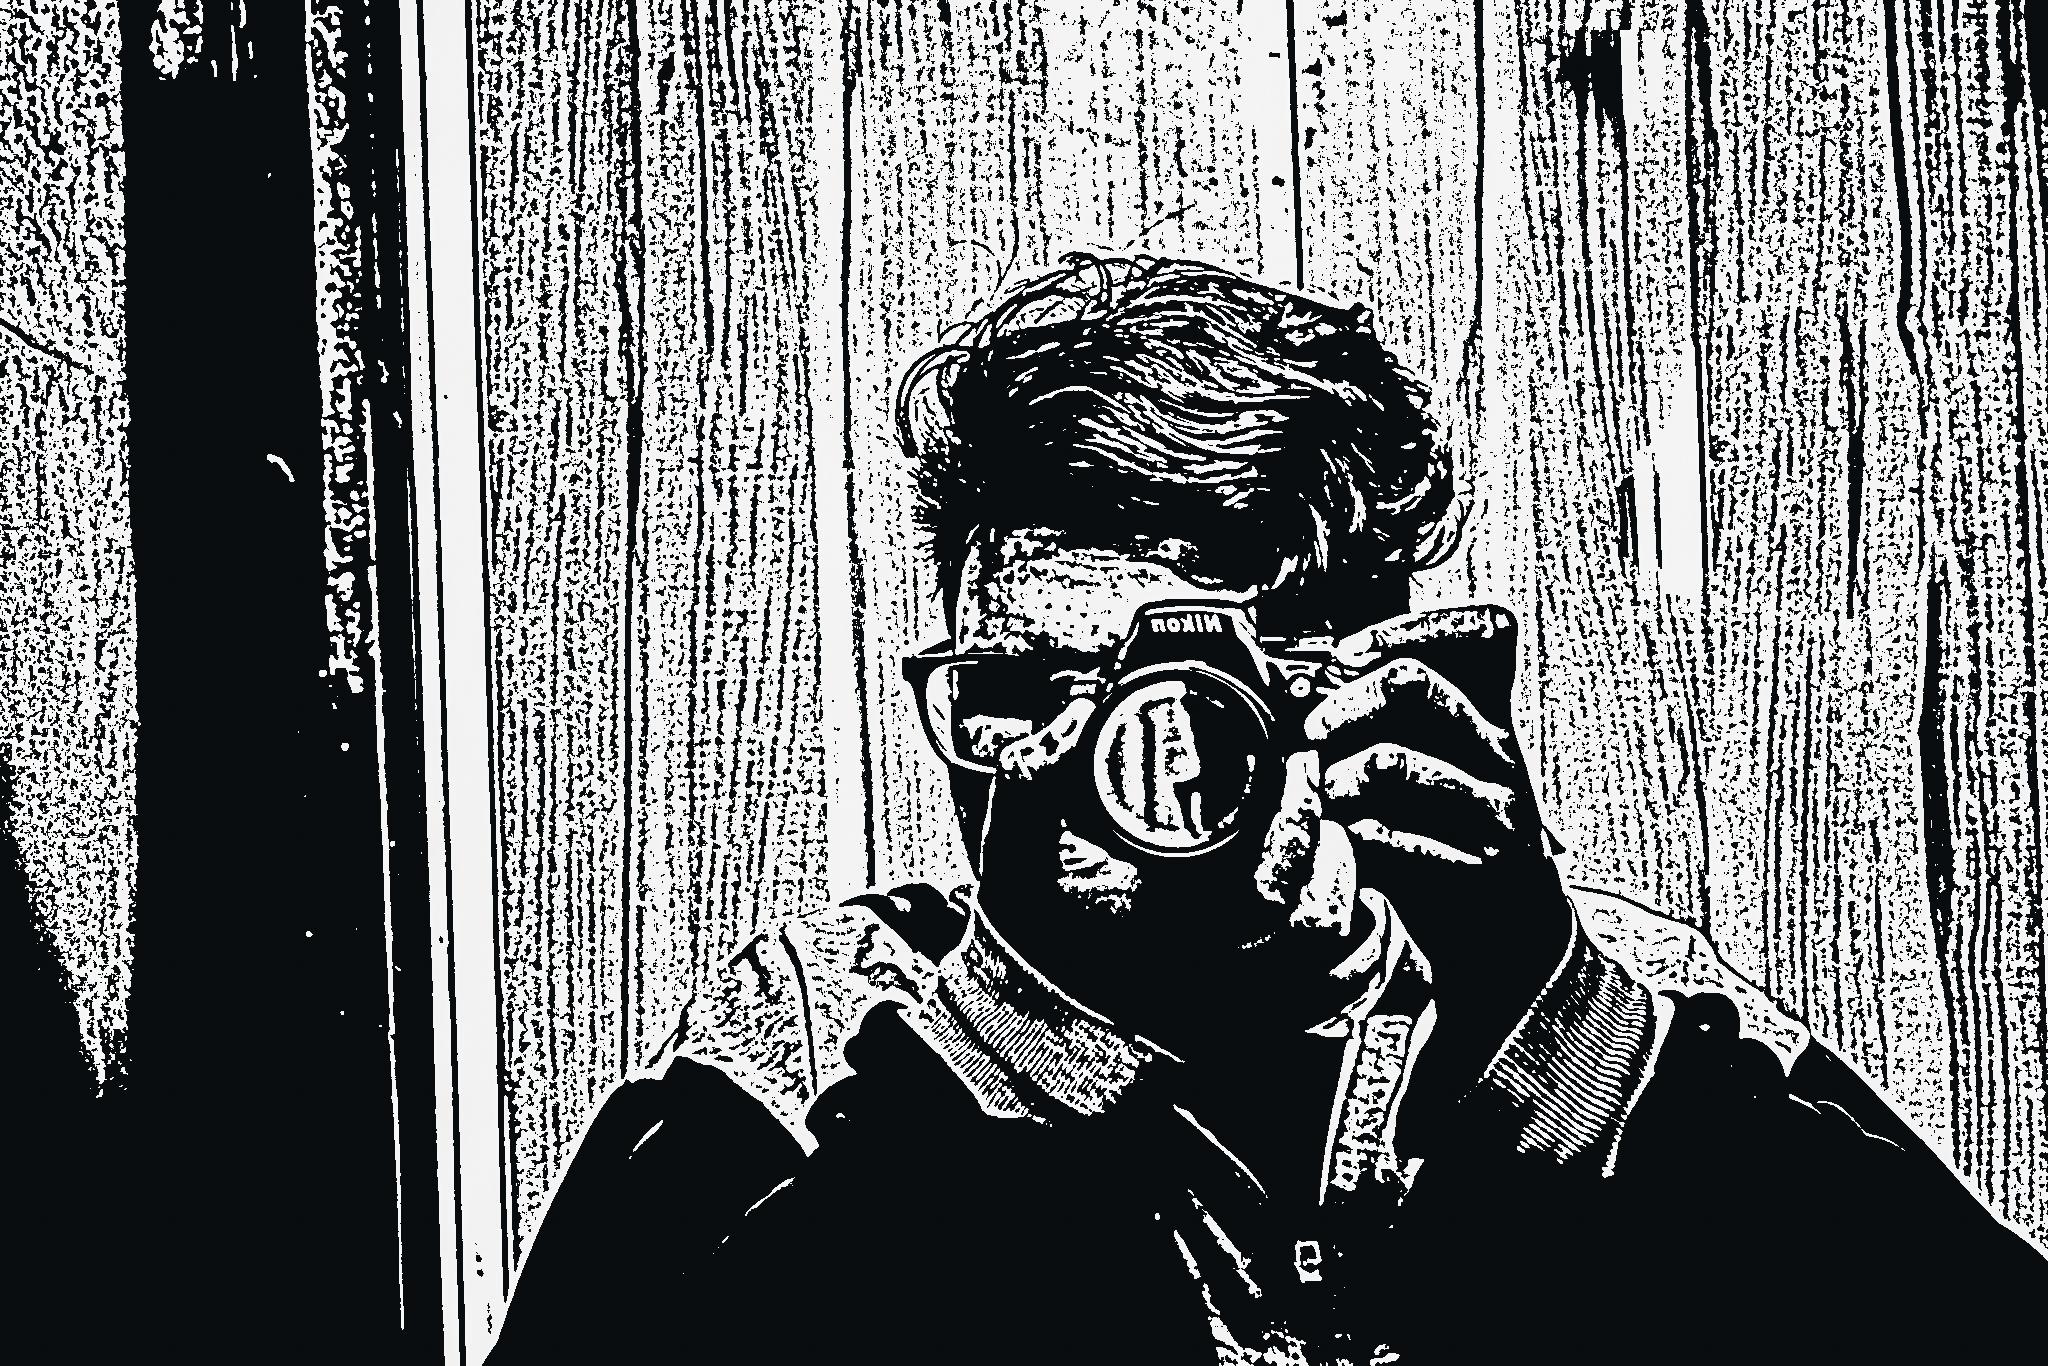 Monochrome self portrait of a guy